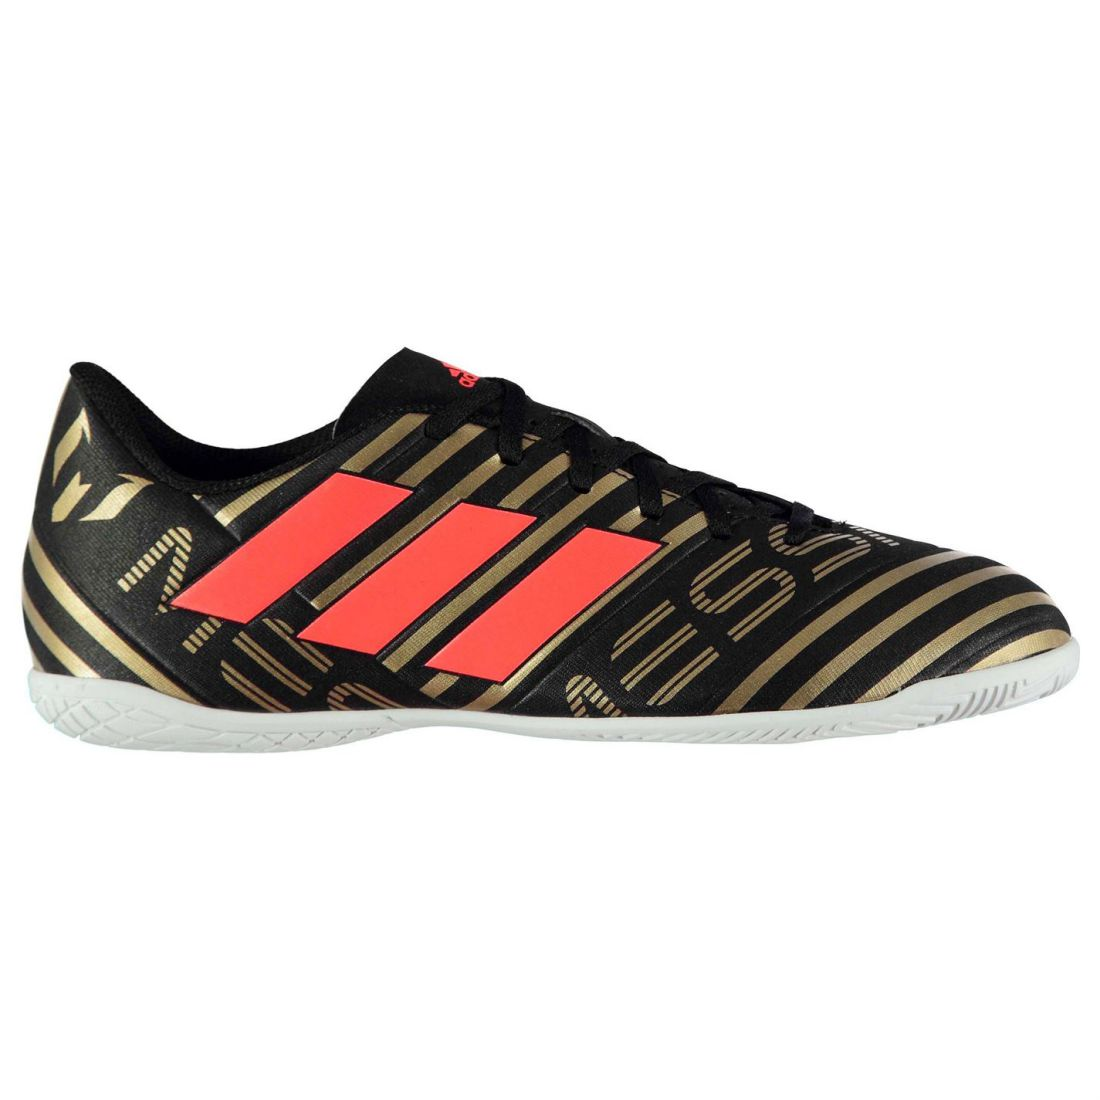 437b20b18d3 adidas Mens Nemeziz Messi Tango 17.4 Indoor Football Trainers ...